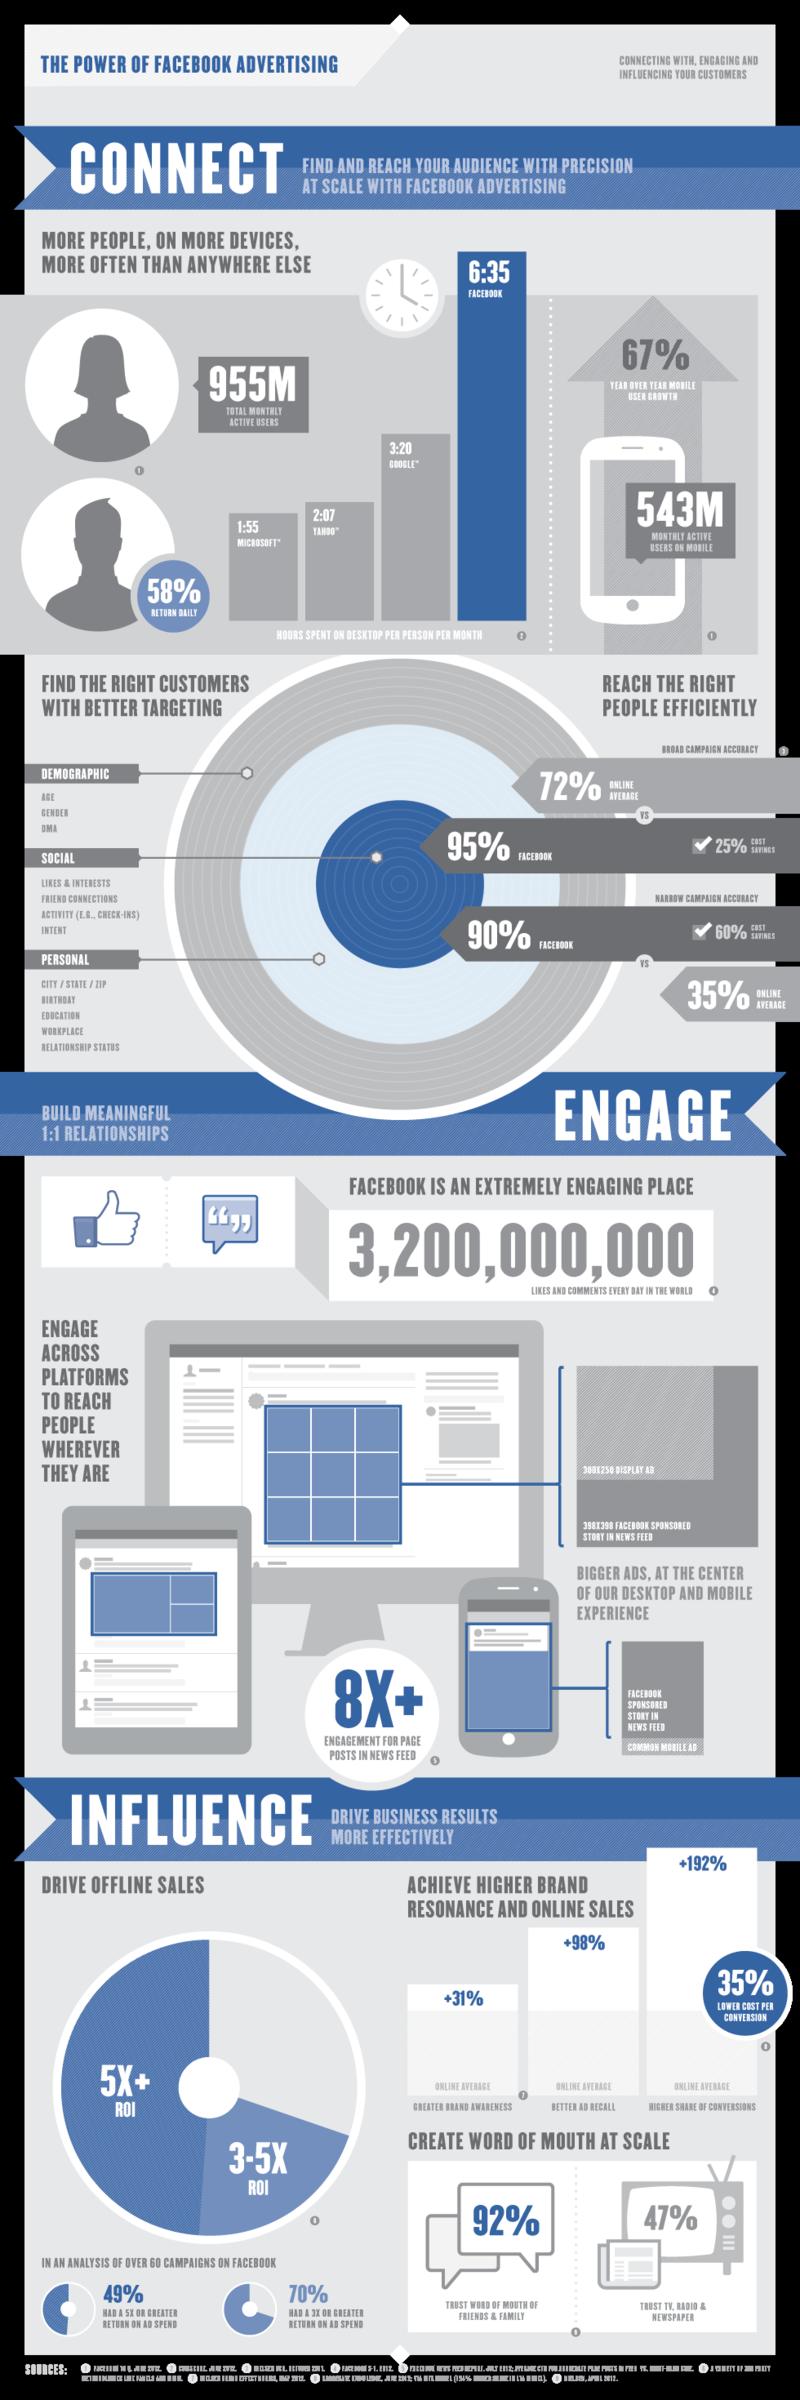 The Power of Facebook Advertising - Facebook - September 2012